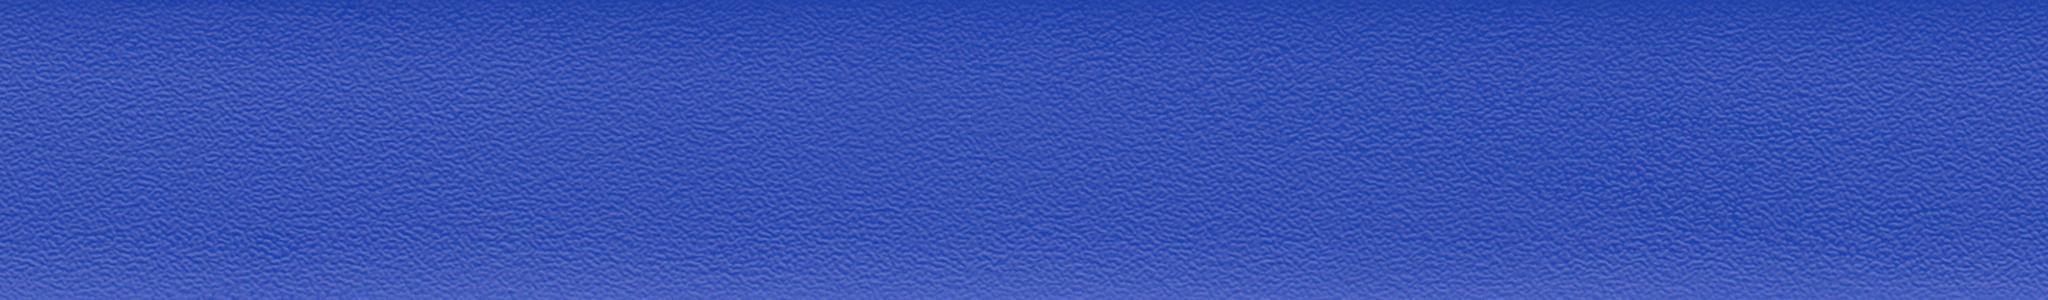 HU 15002 ABS Kante UNI Blau perl 101